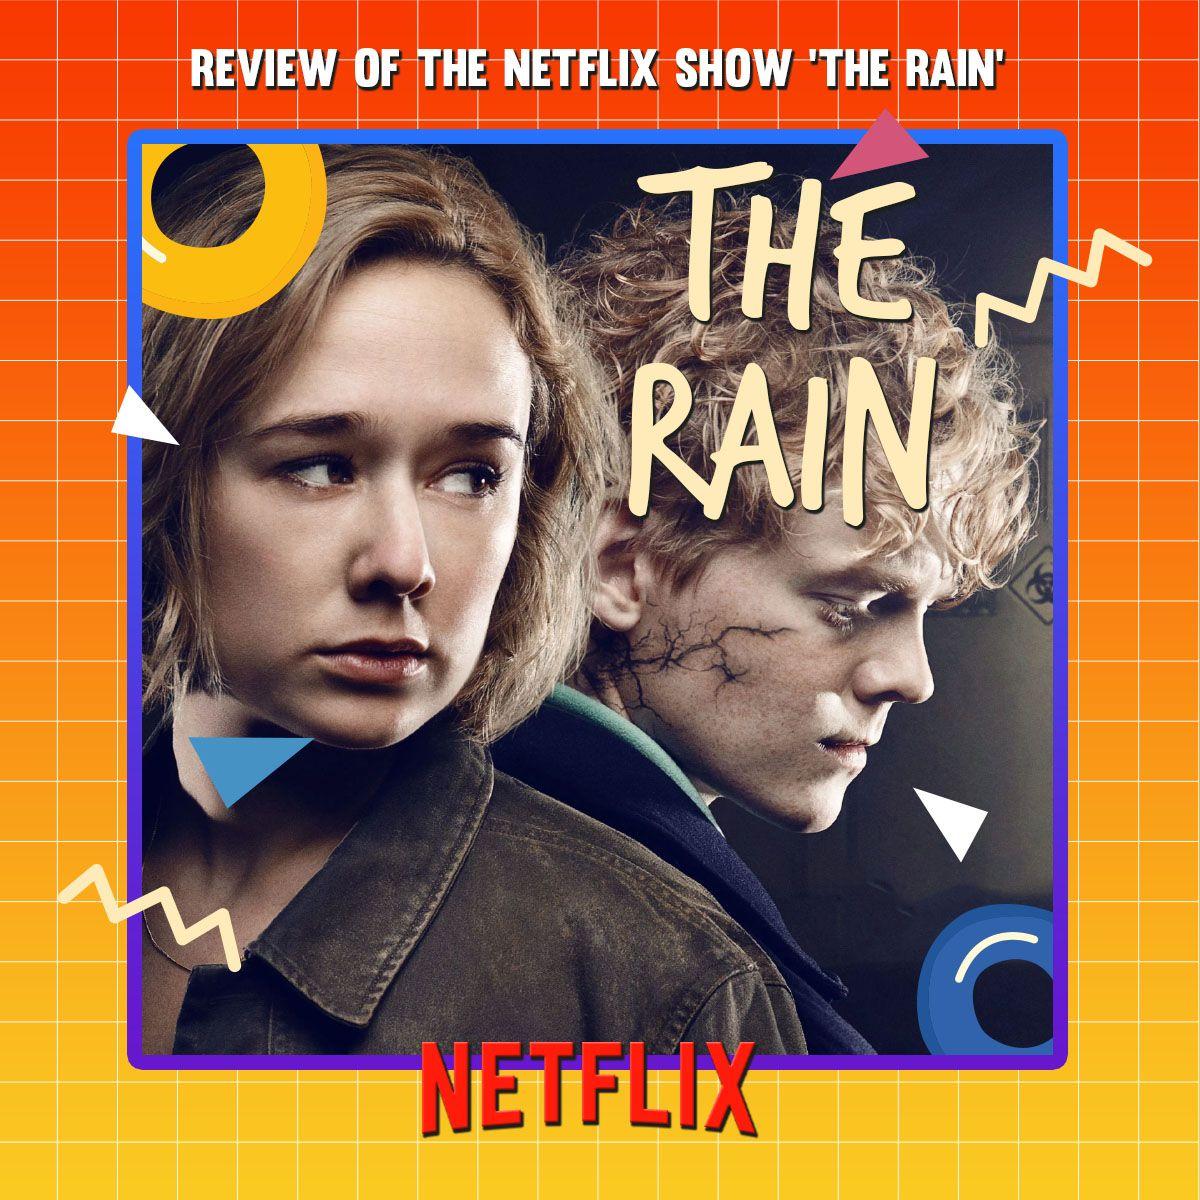 Pin On Netflix Reviews